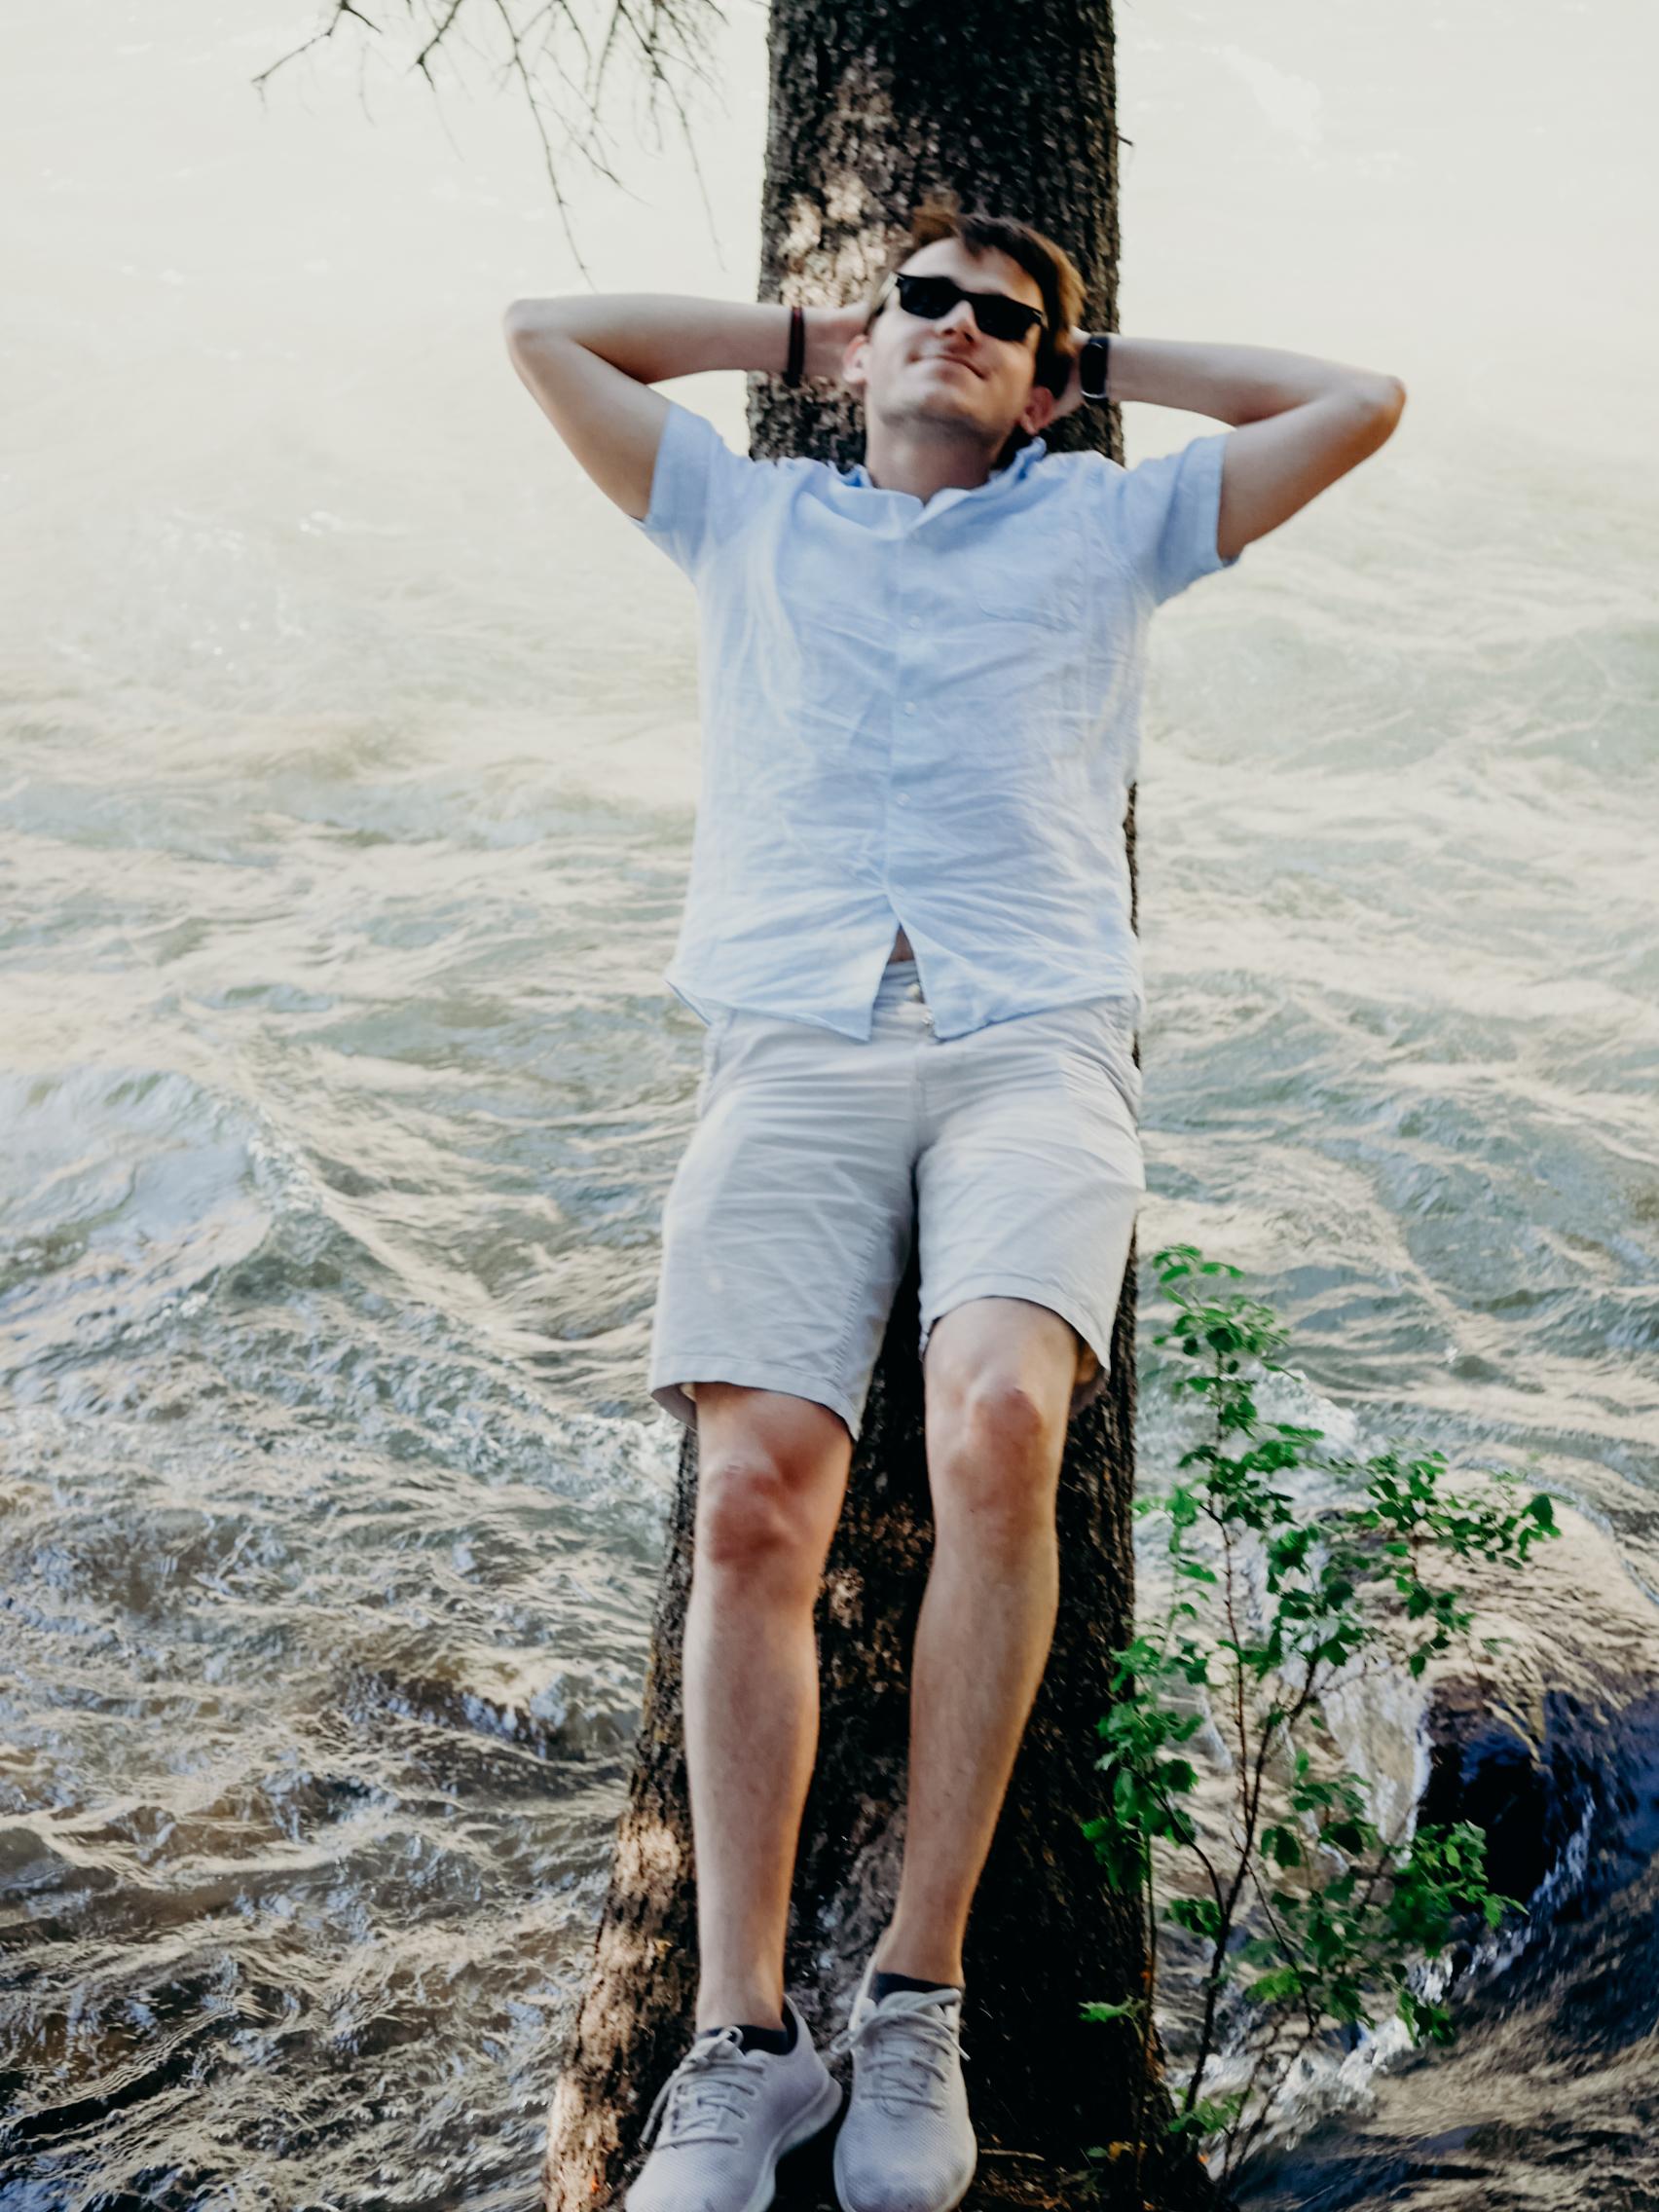 Visit Jackson Hole & The Grand Tetons